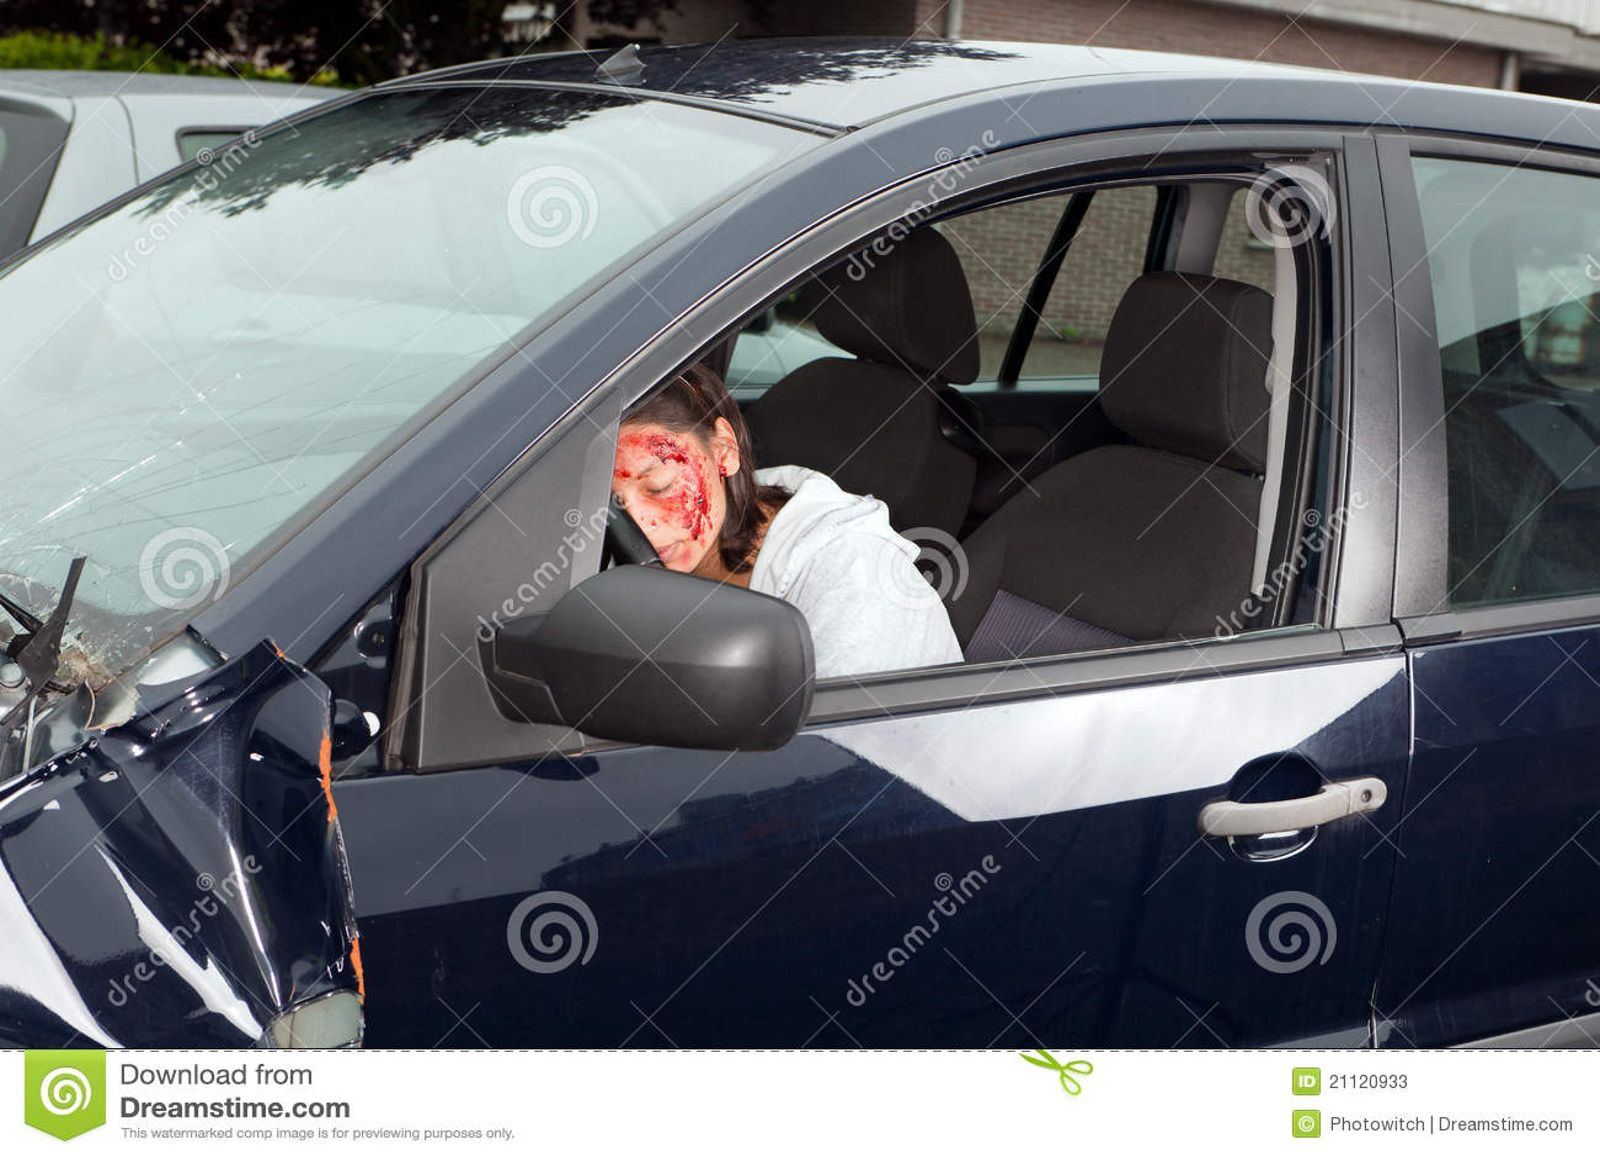 Trauma After Car Accident